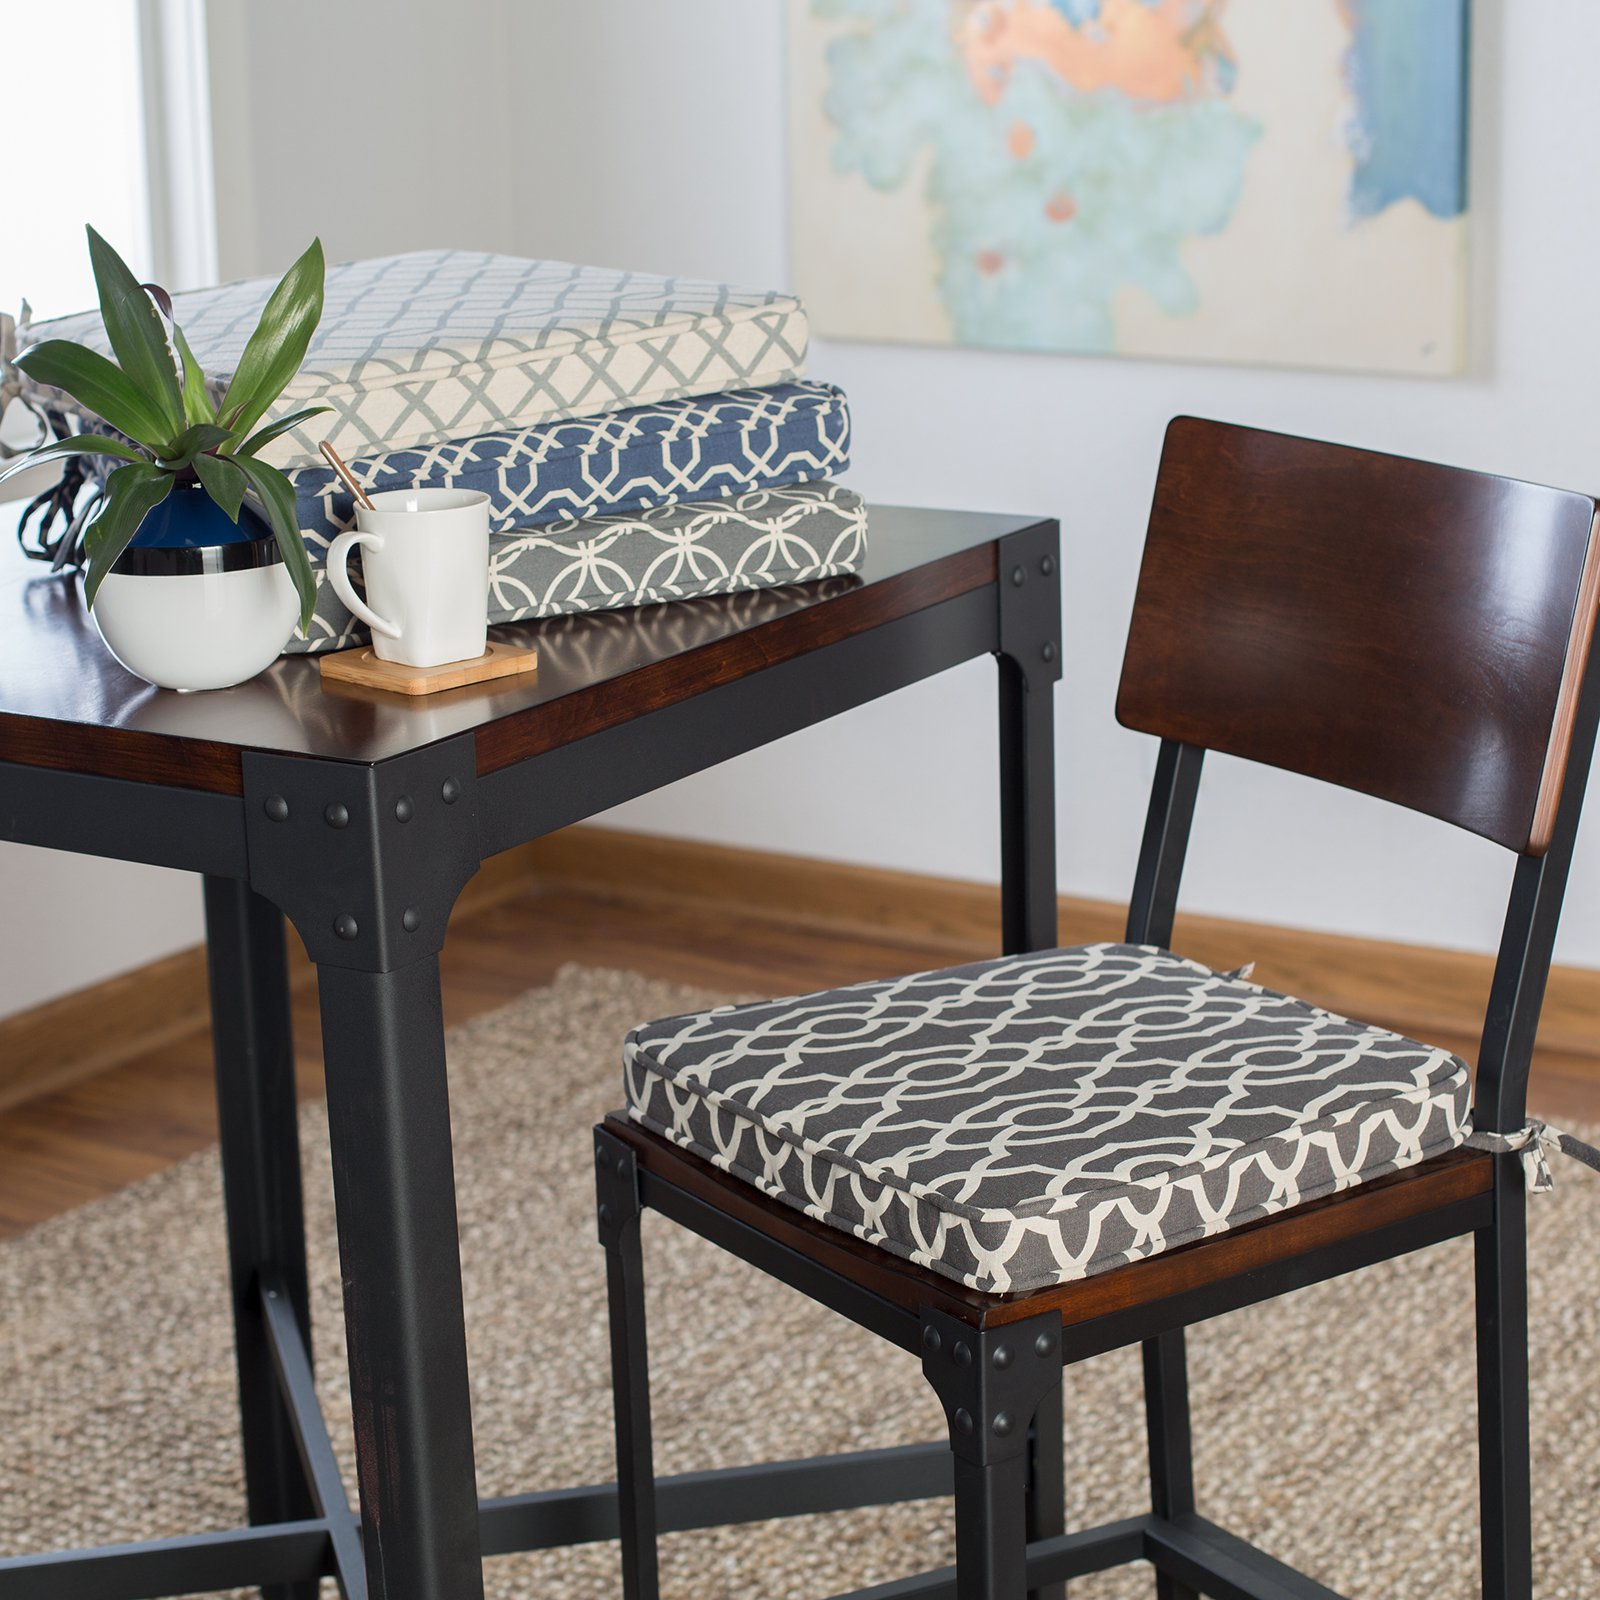 Dining room chair cushion Belham Living printed indoor dining room chair cushion |  Hayneedle QPWLQUT